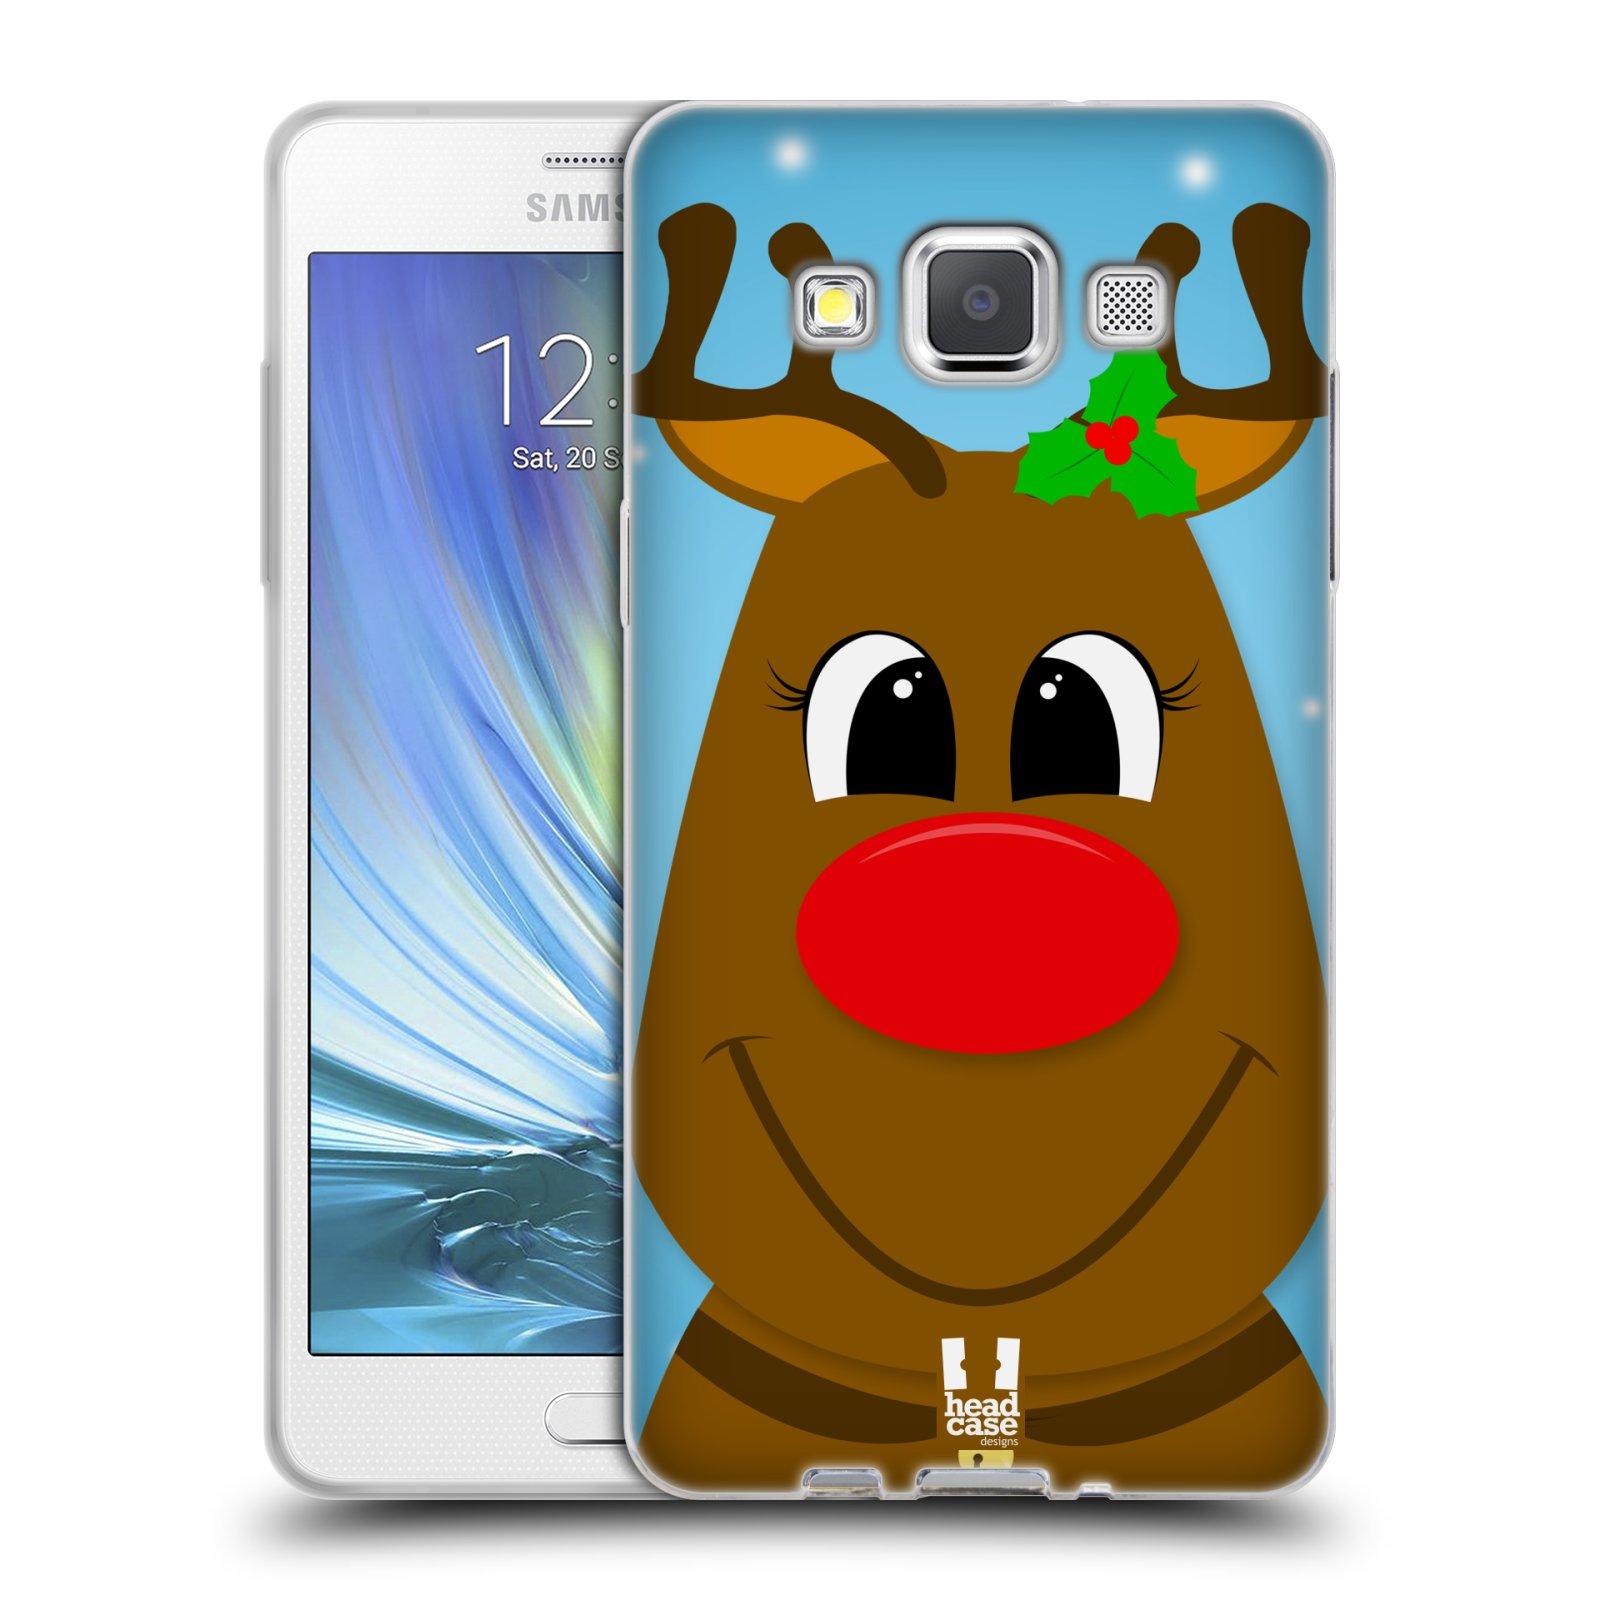 HEAD CASE silikonový obal na mobil Samsung Galaxy A5 vzor Vánoční tváře kreslené SOB RUDOLF